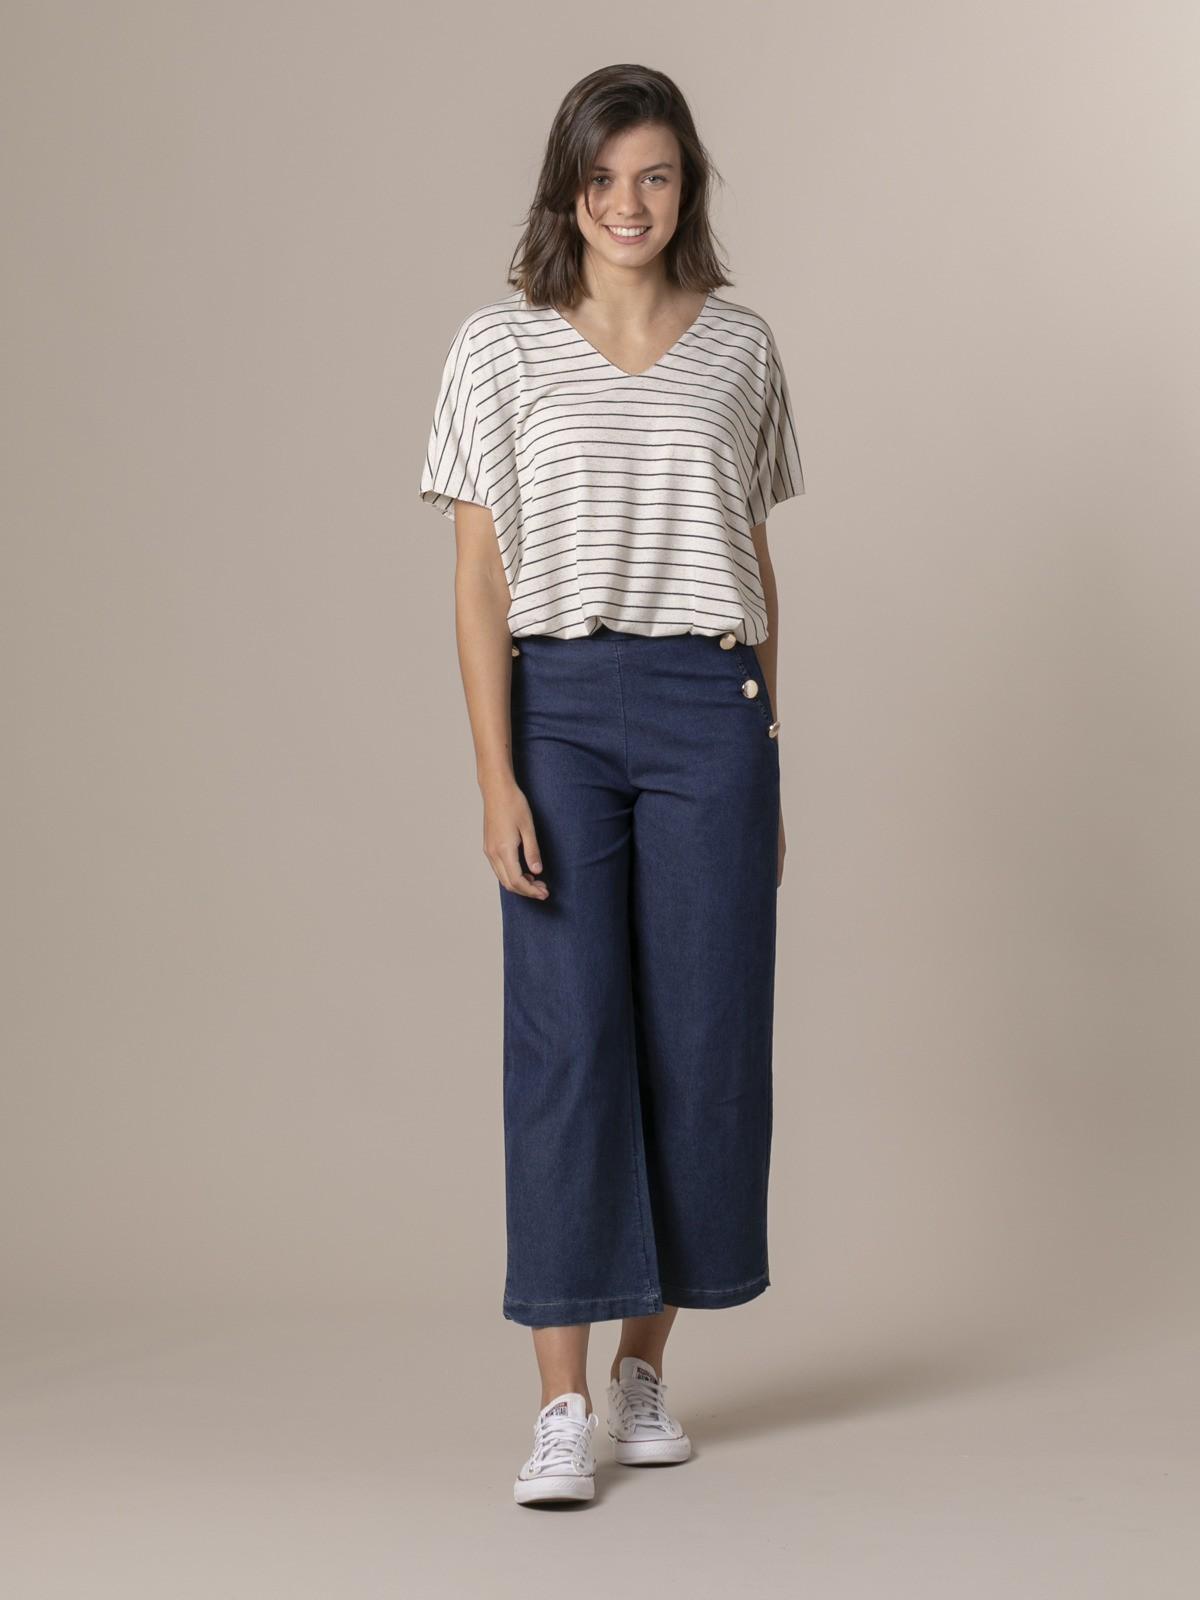 Pantalón vaquero mujer botones Azul Jean